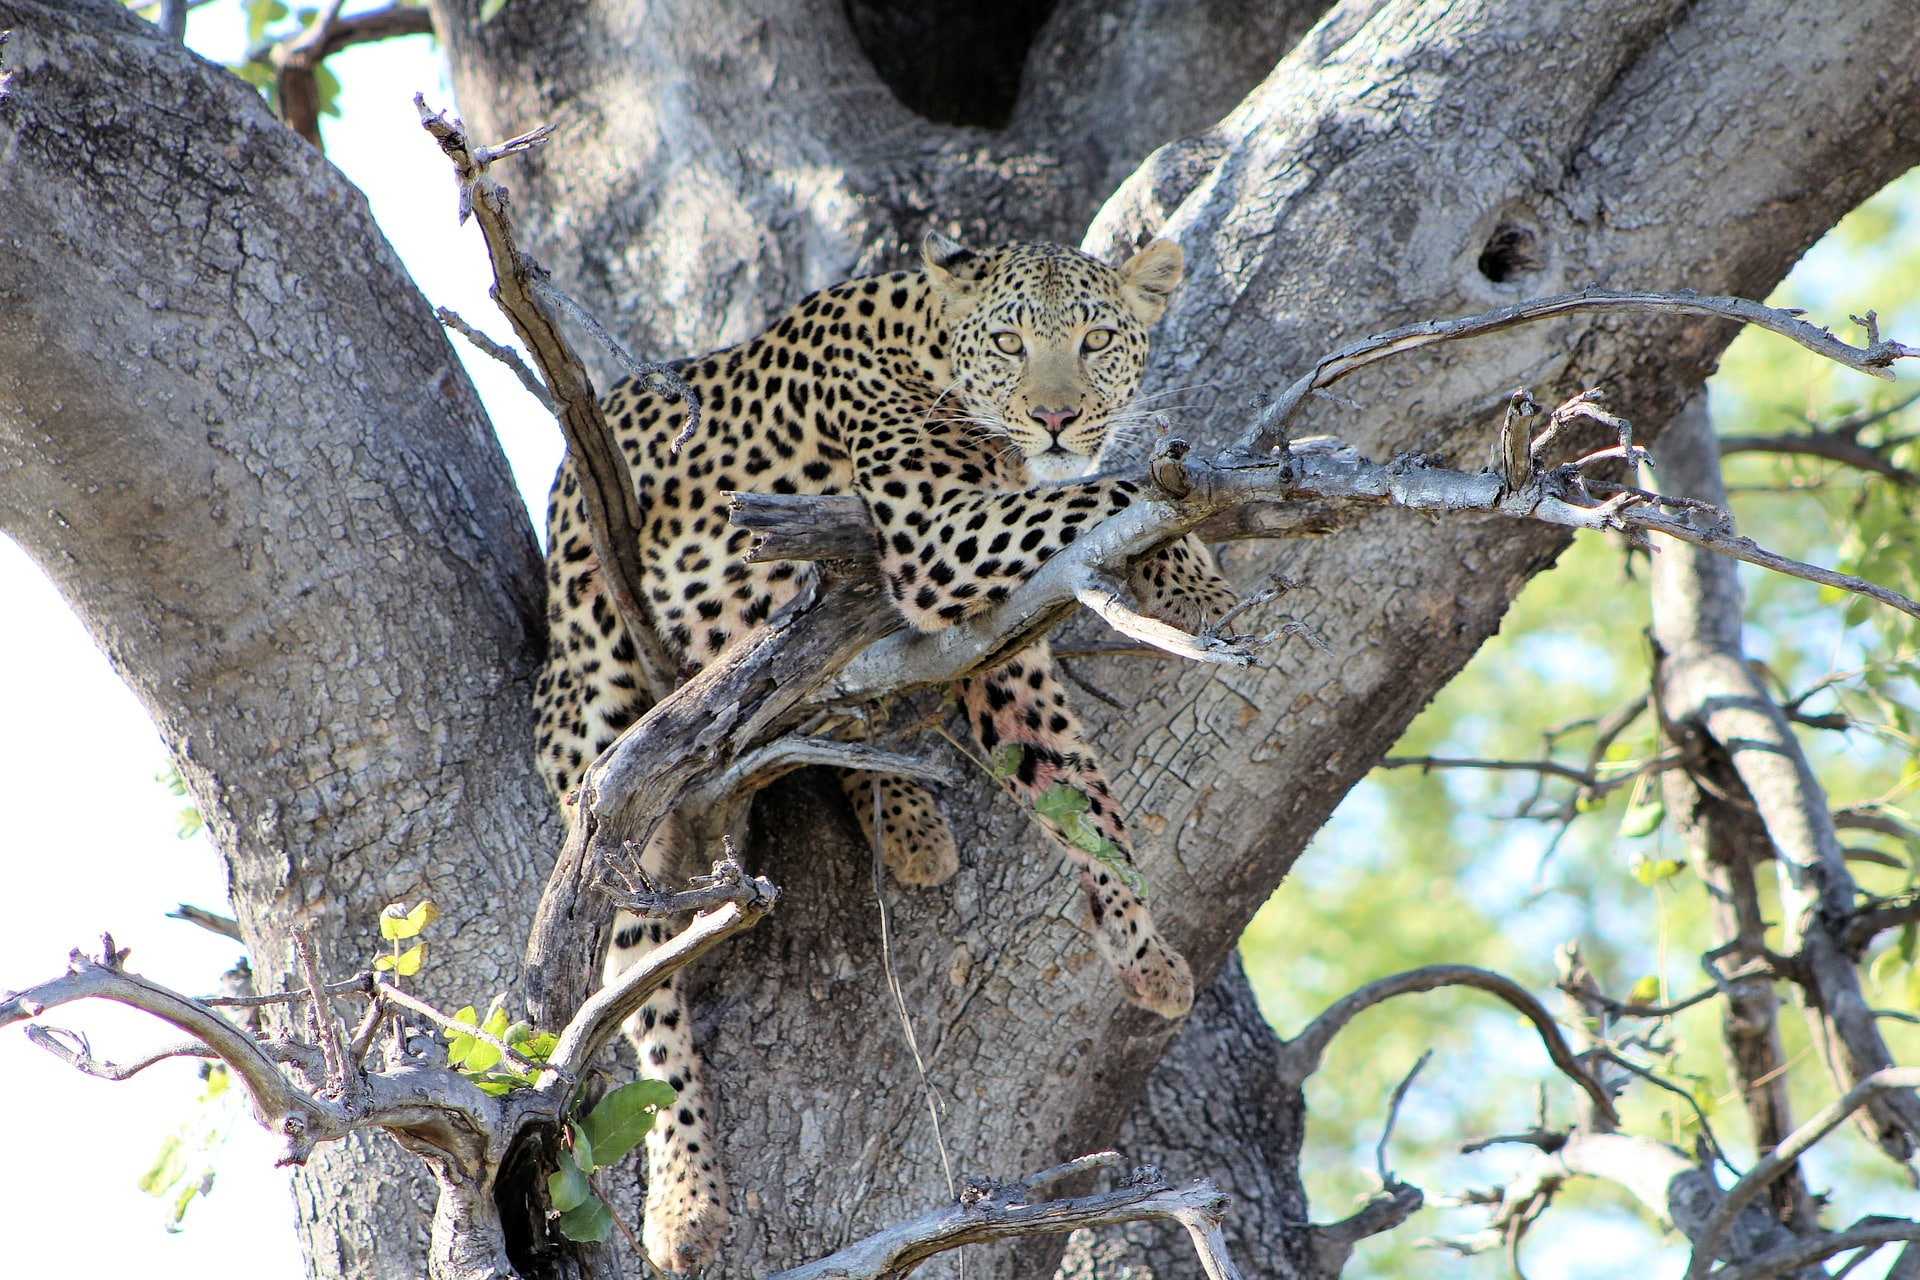 Leopard Africa safari